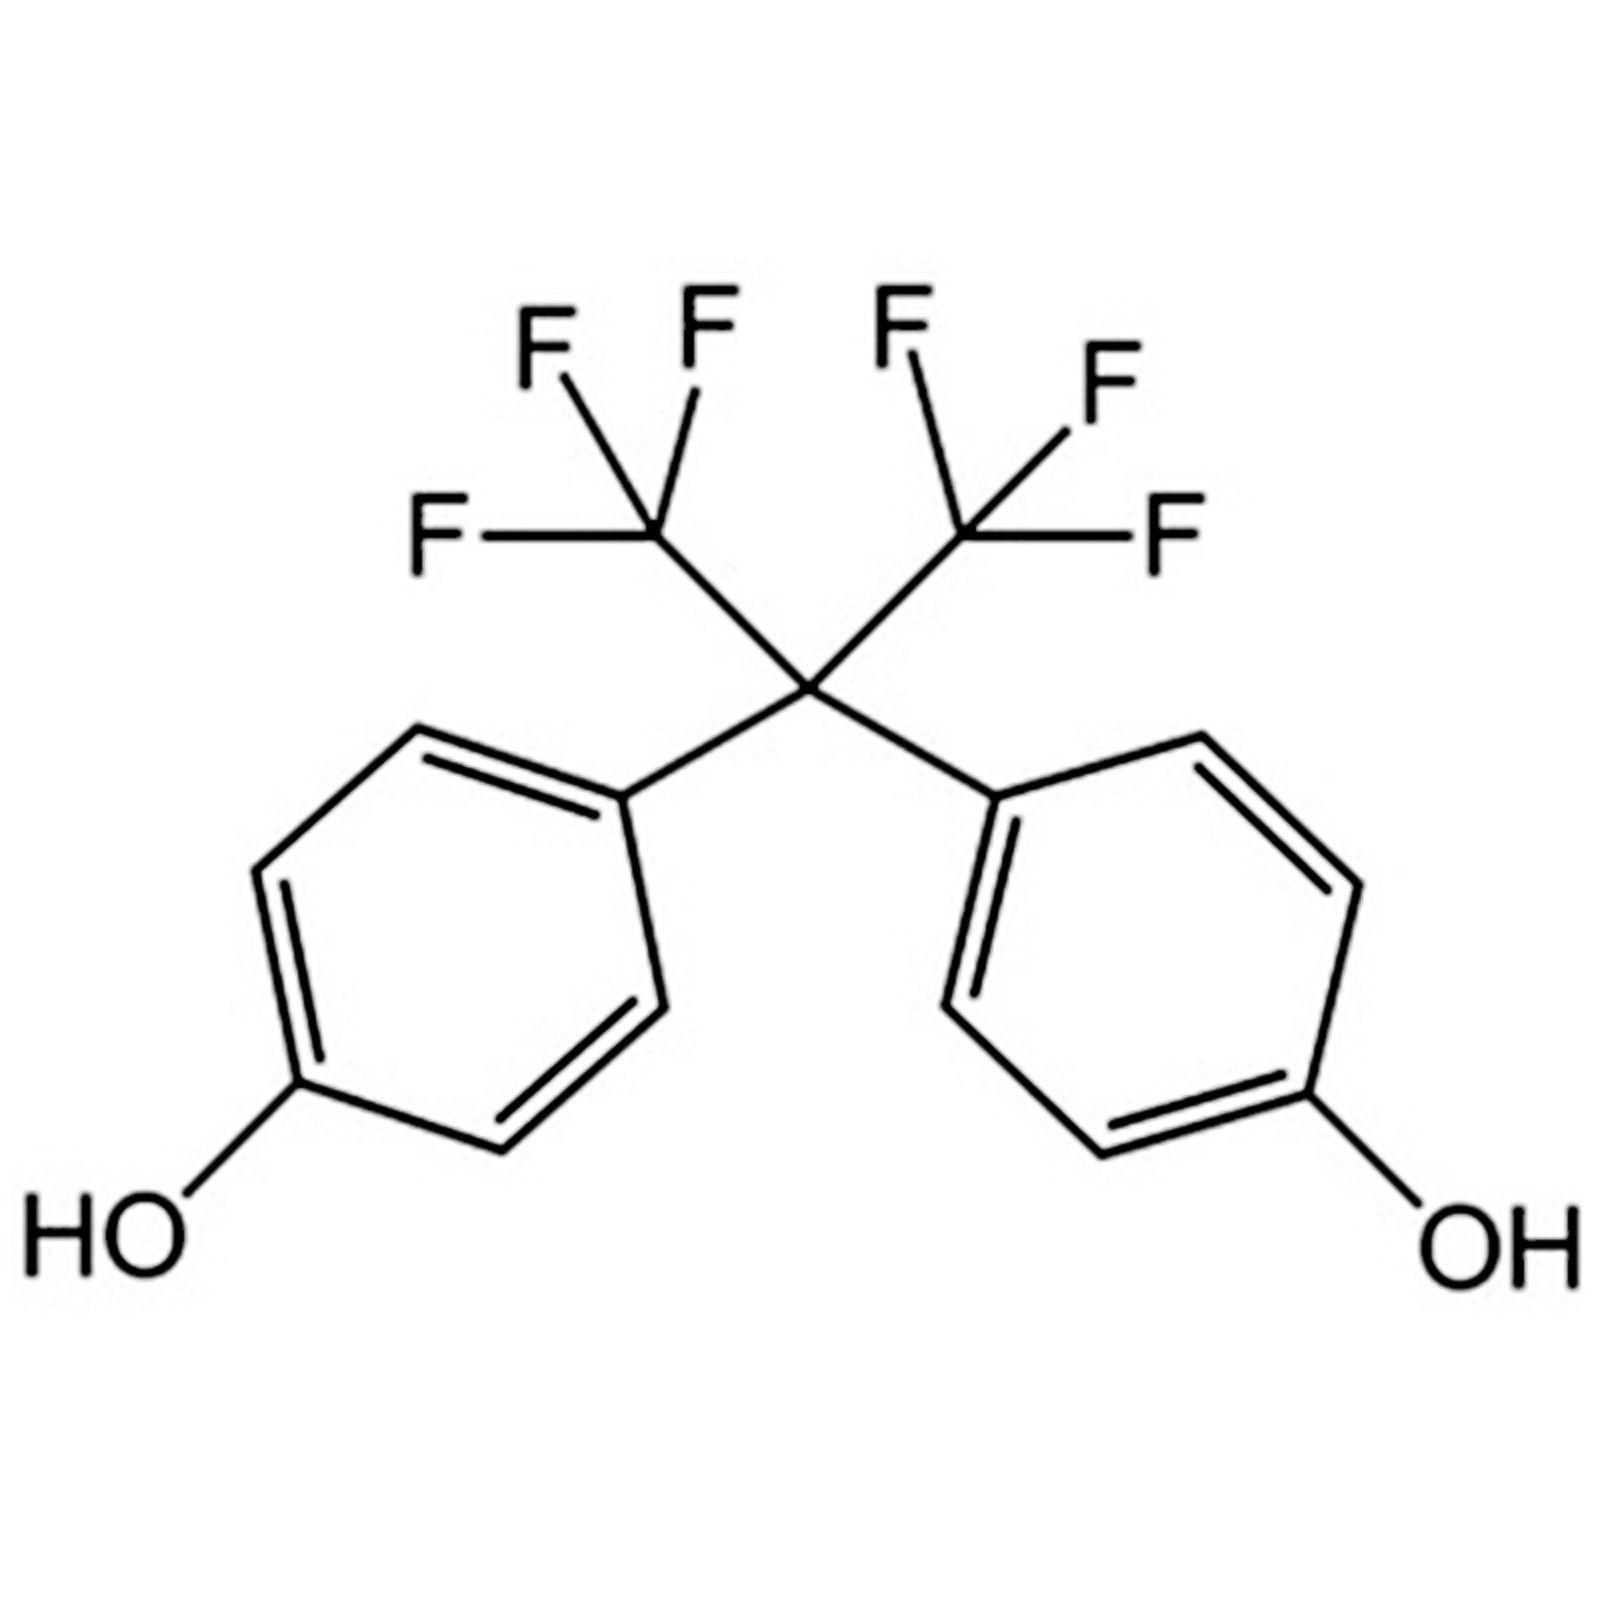 BPAF, Hexafluorobisphenol A (Cas No. 1478-61-1)